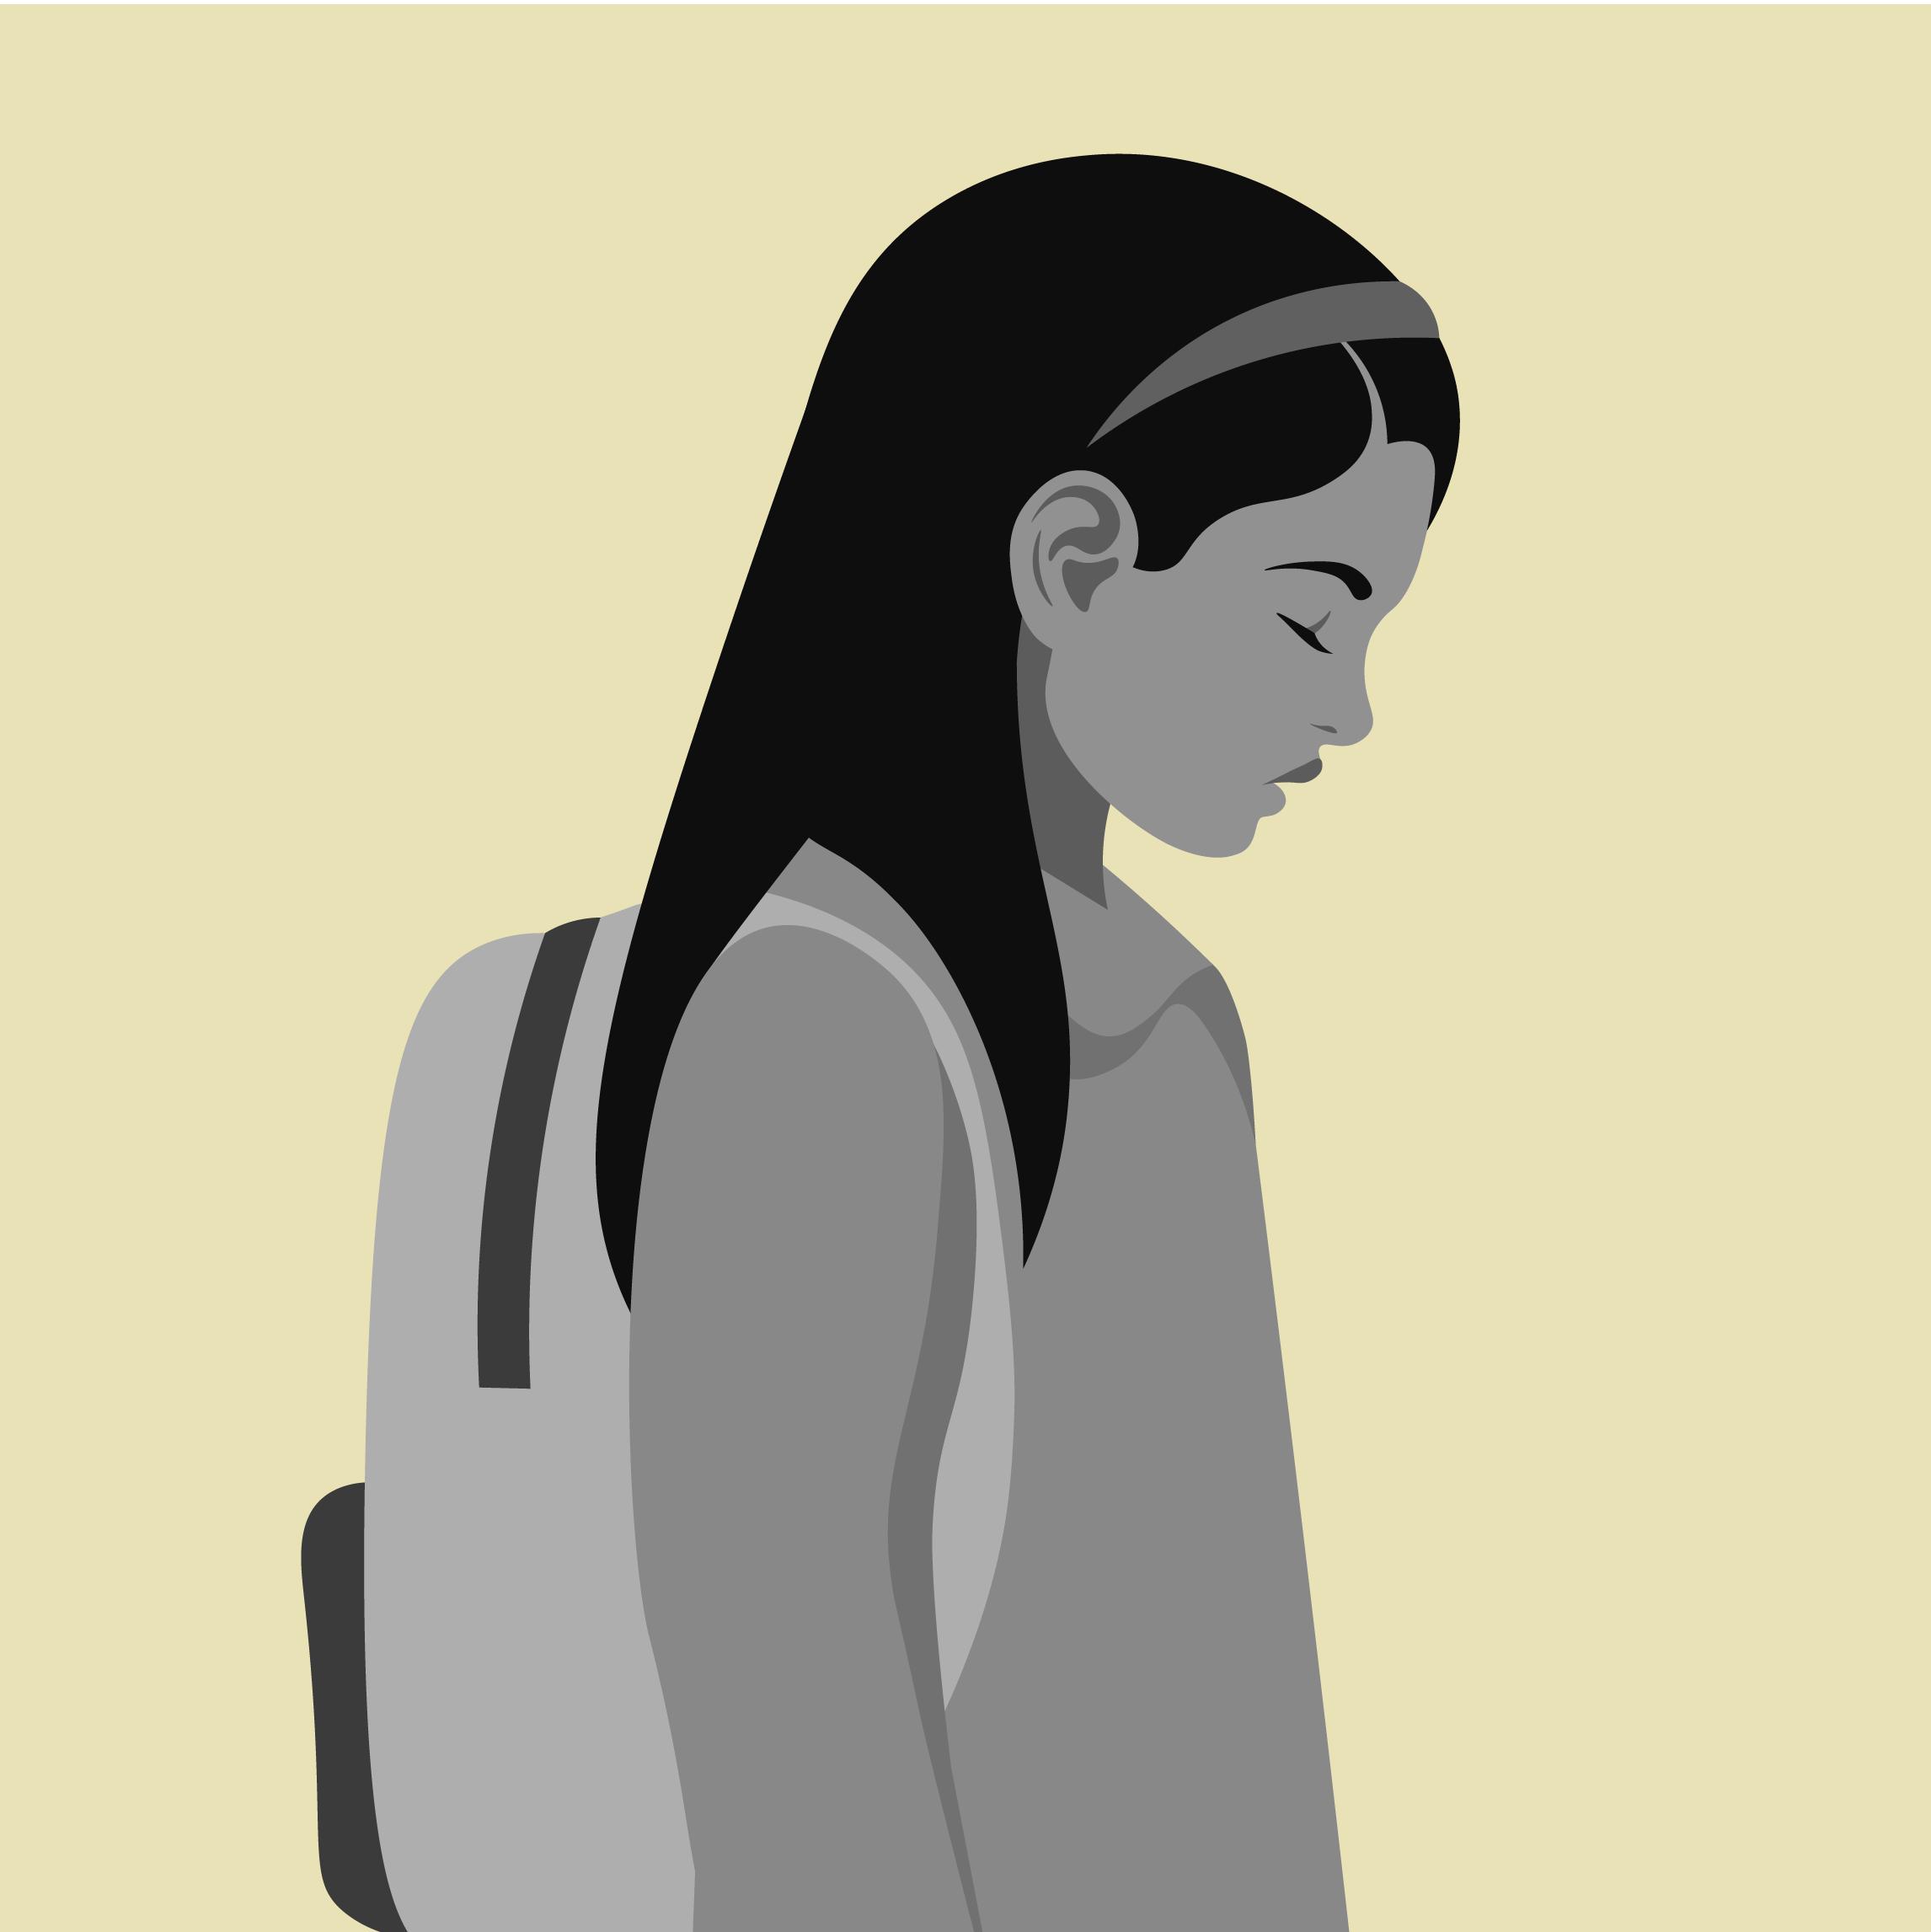 An illustration of a schoolchild looking sad